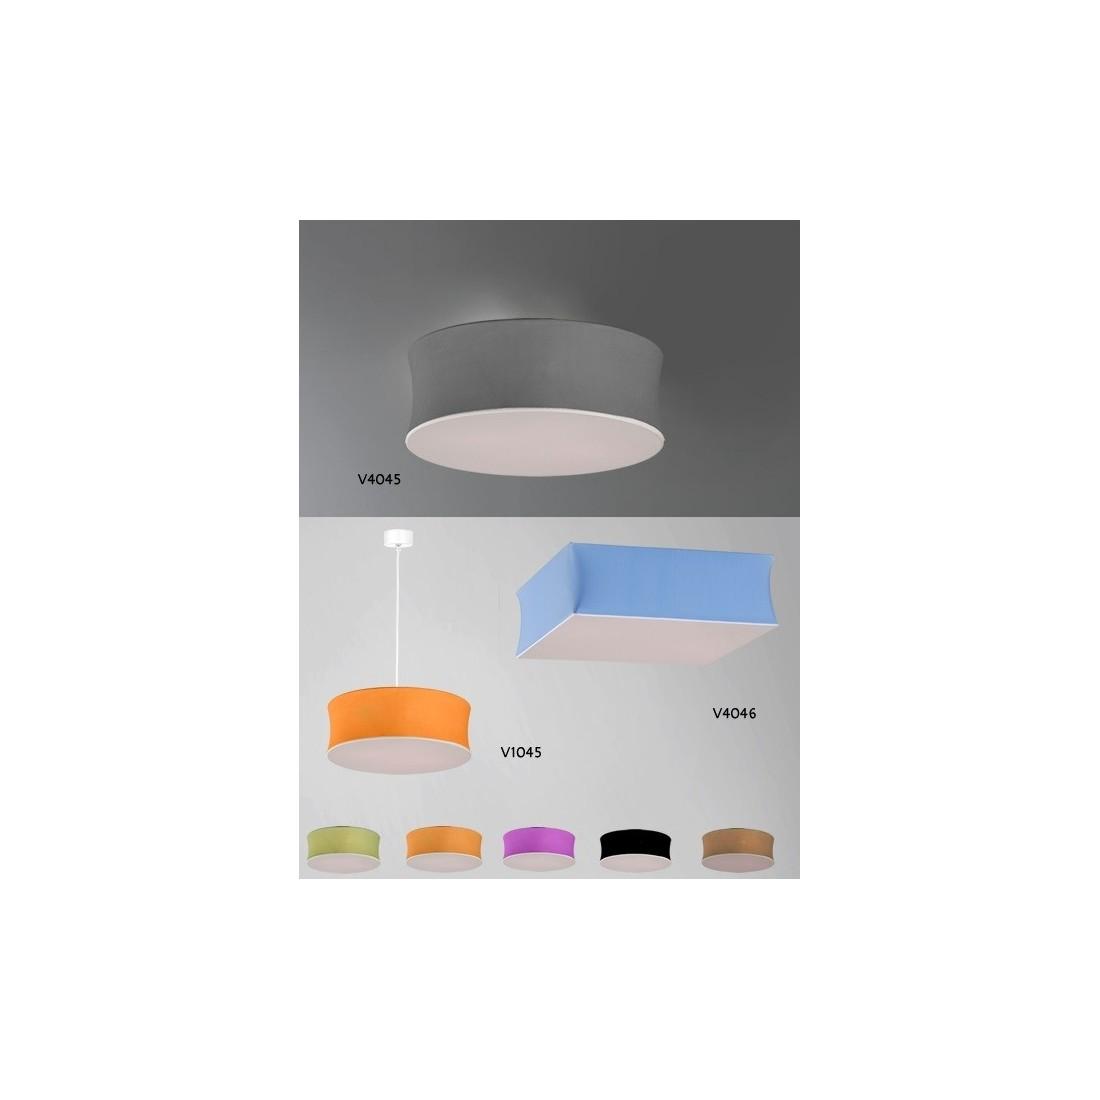 Lamparas infantiles lamparas dormitorio ni o lamparas - Lamparas de techo infantiles ...